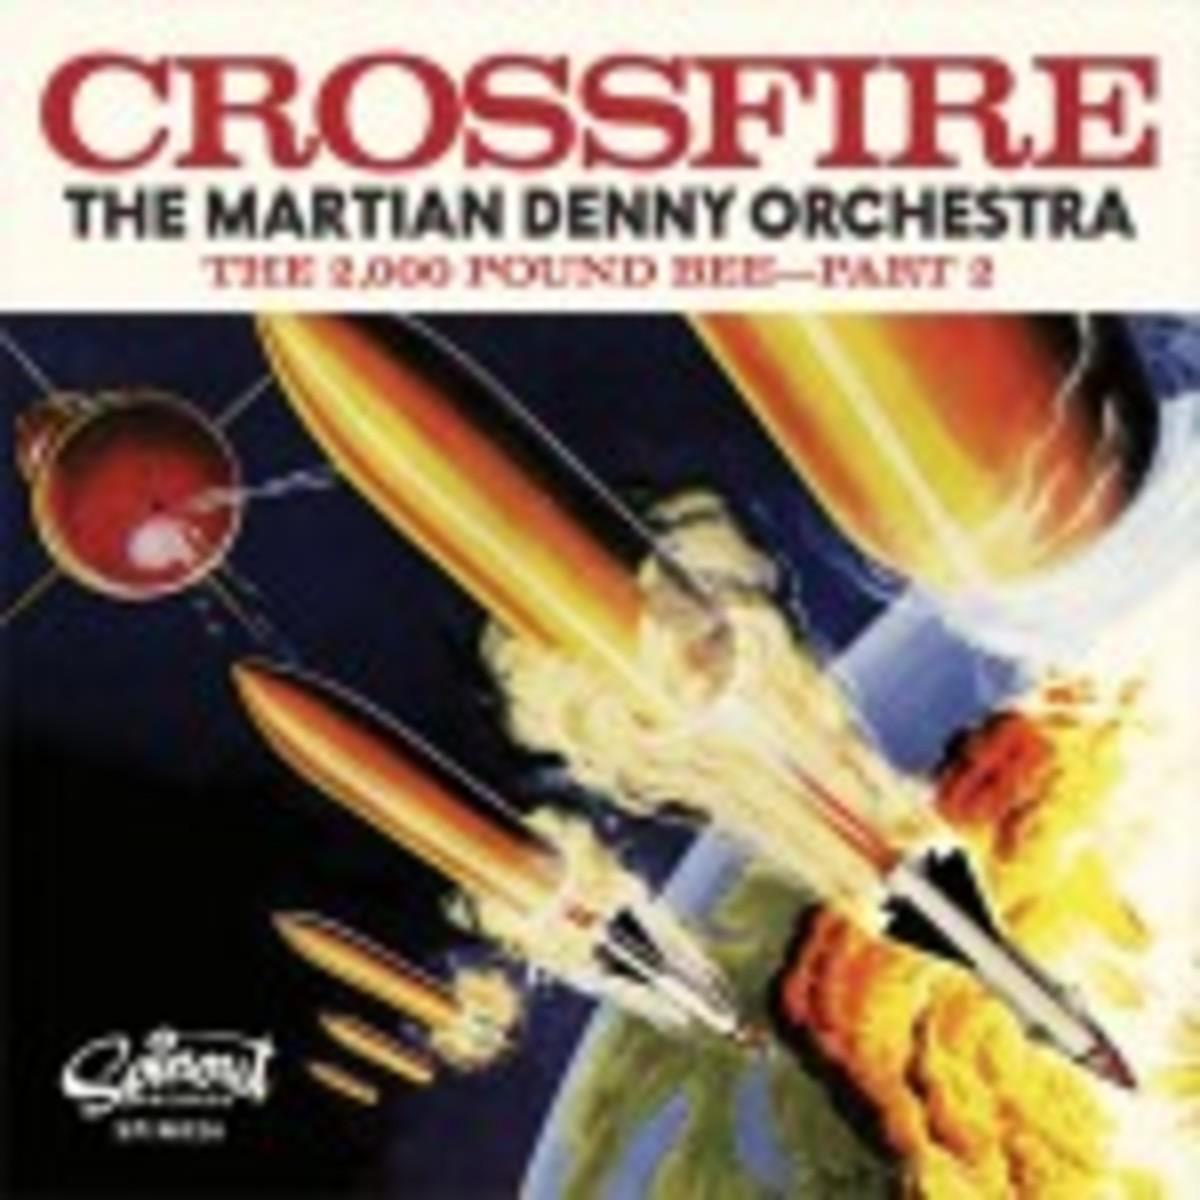 The Martian Denny Orchestra Record Store Day single